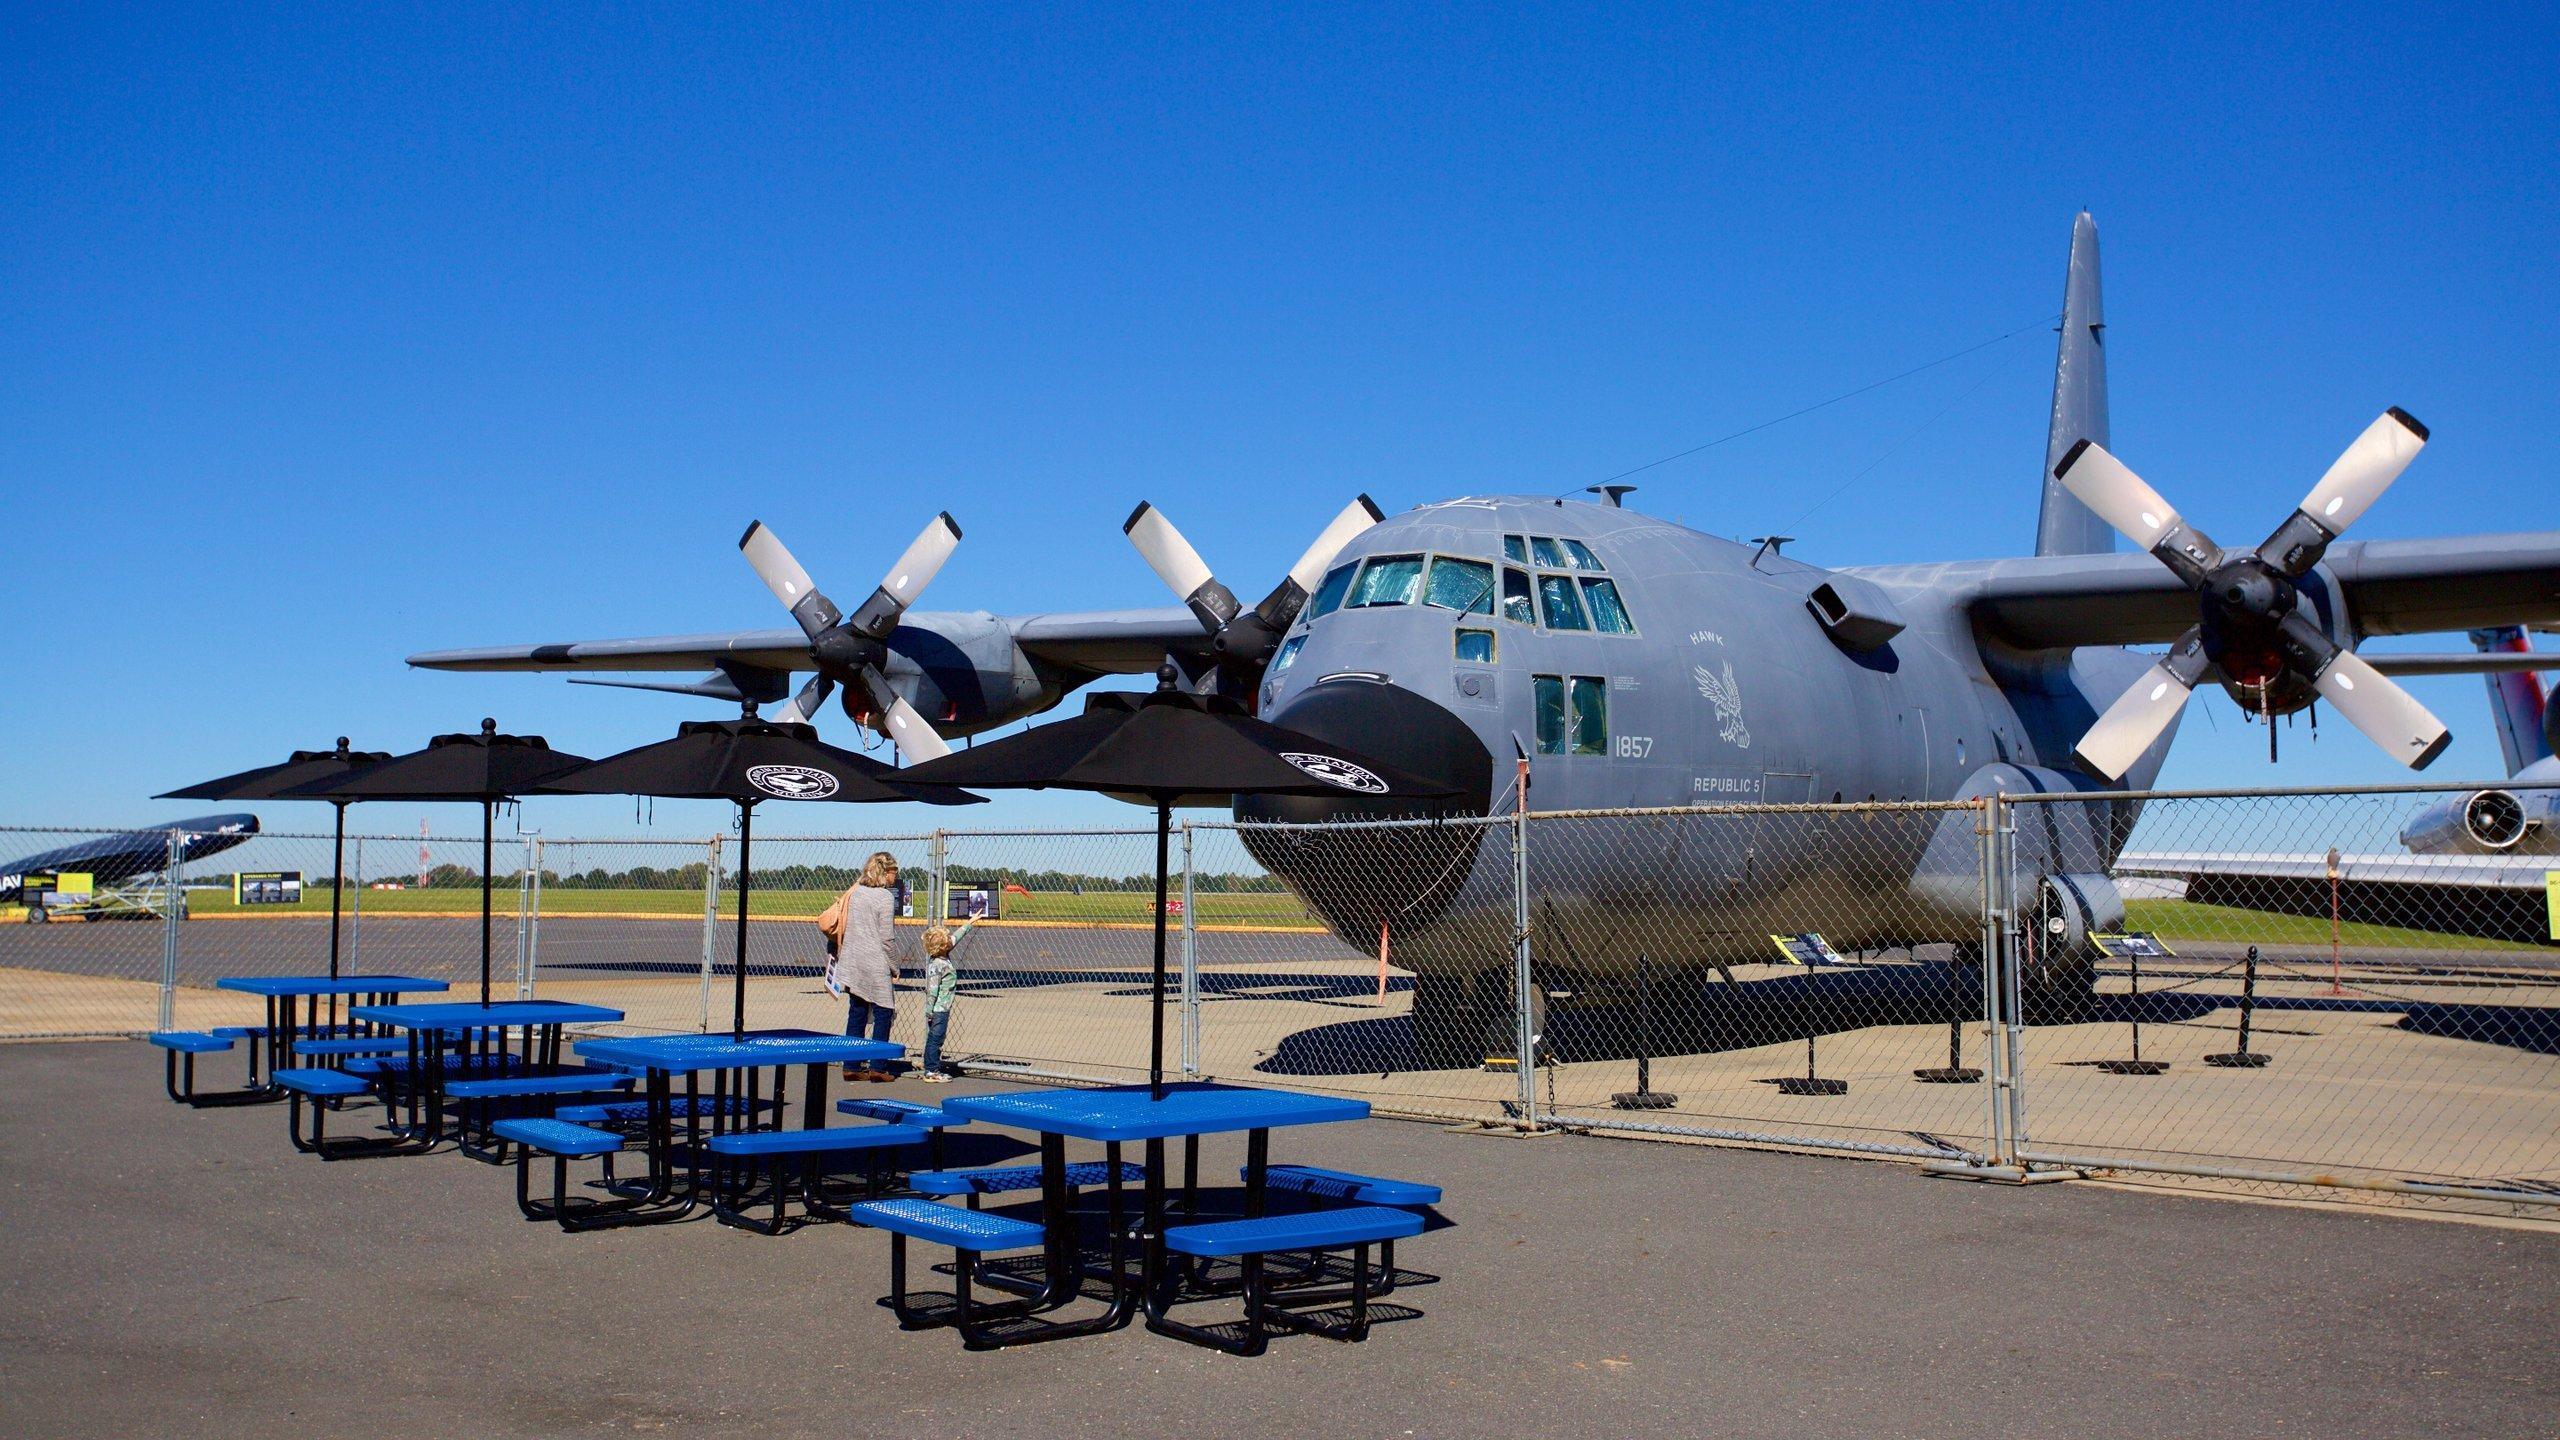 Carolinas Aviation Museum, Charlotte, North Carolina, United States of America